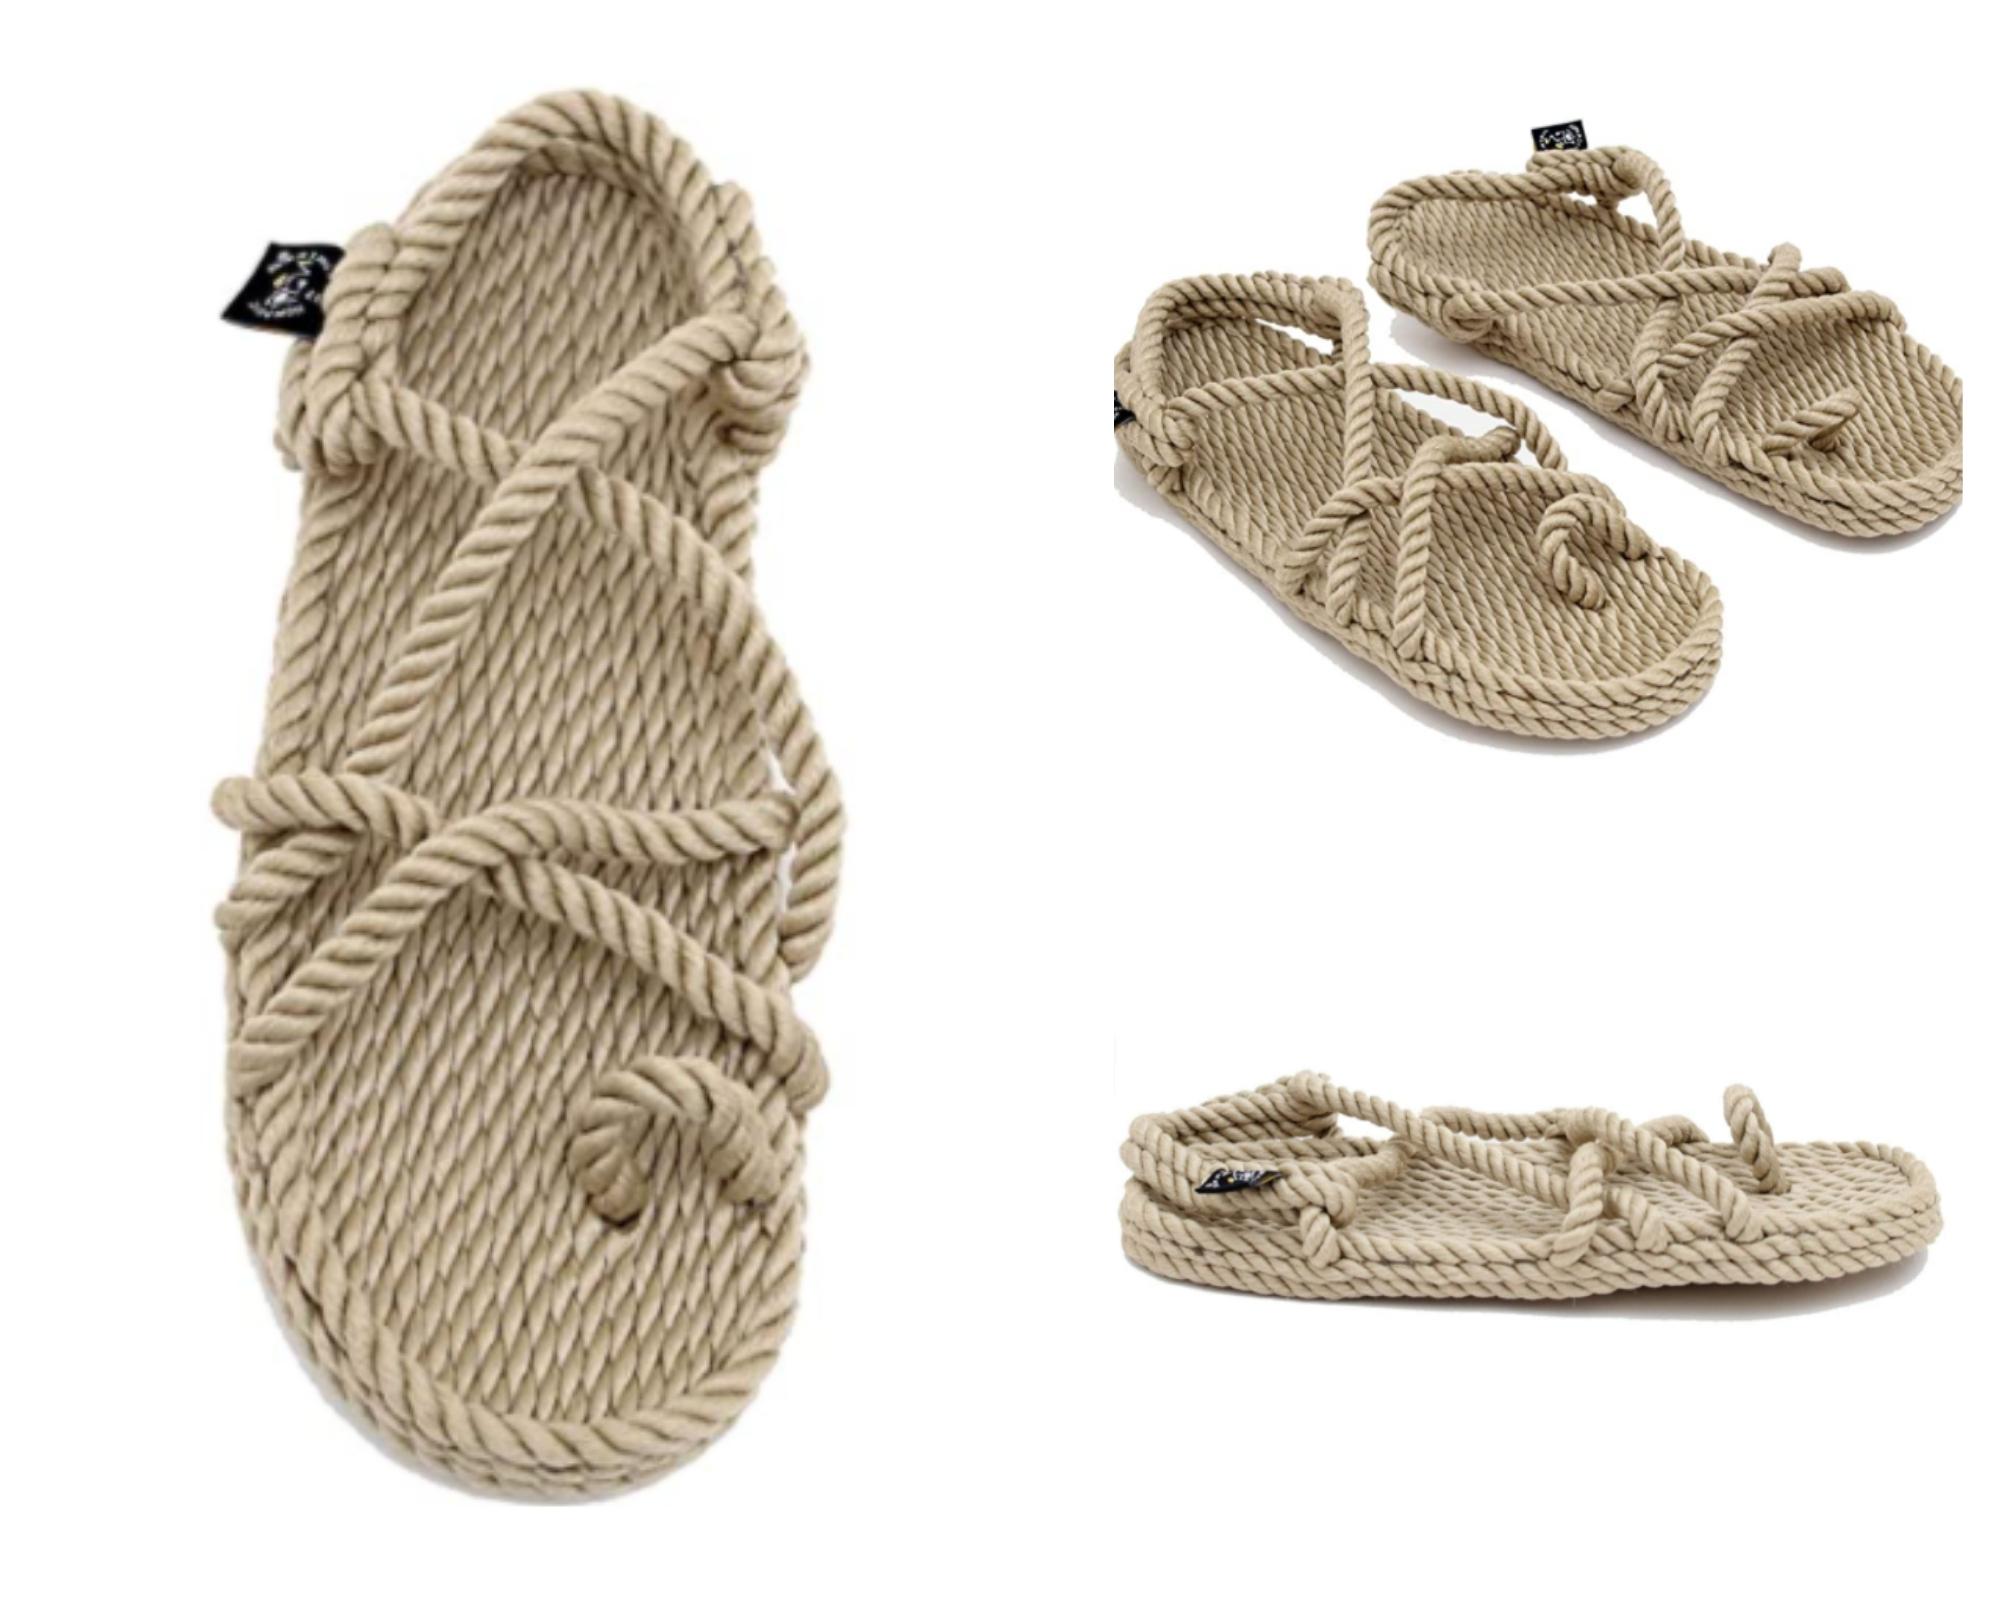 Nomadics Toe Joe - Sandalias de cuerda unisex para adultos, color camel